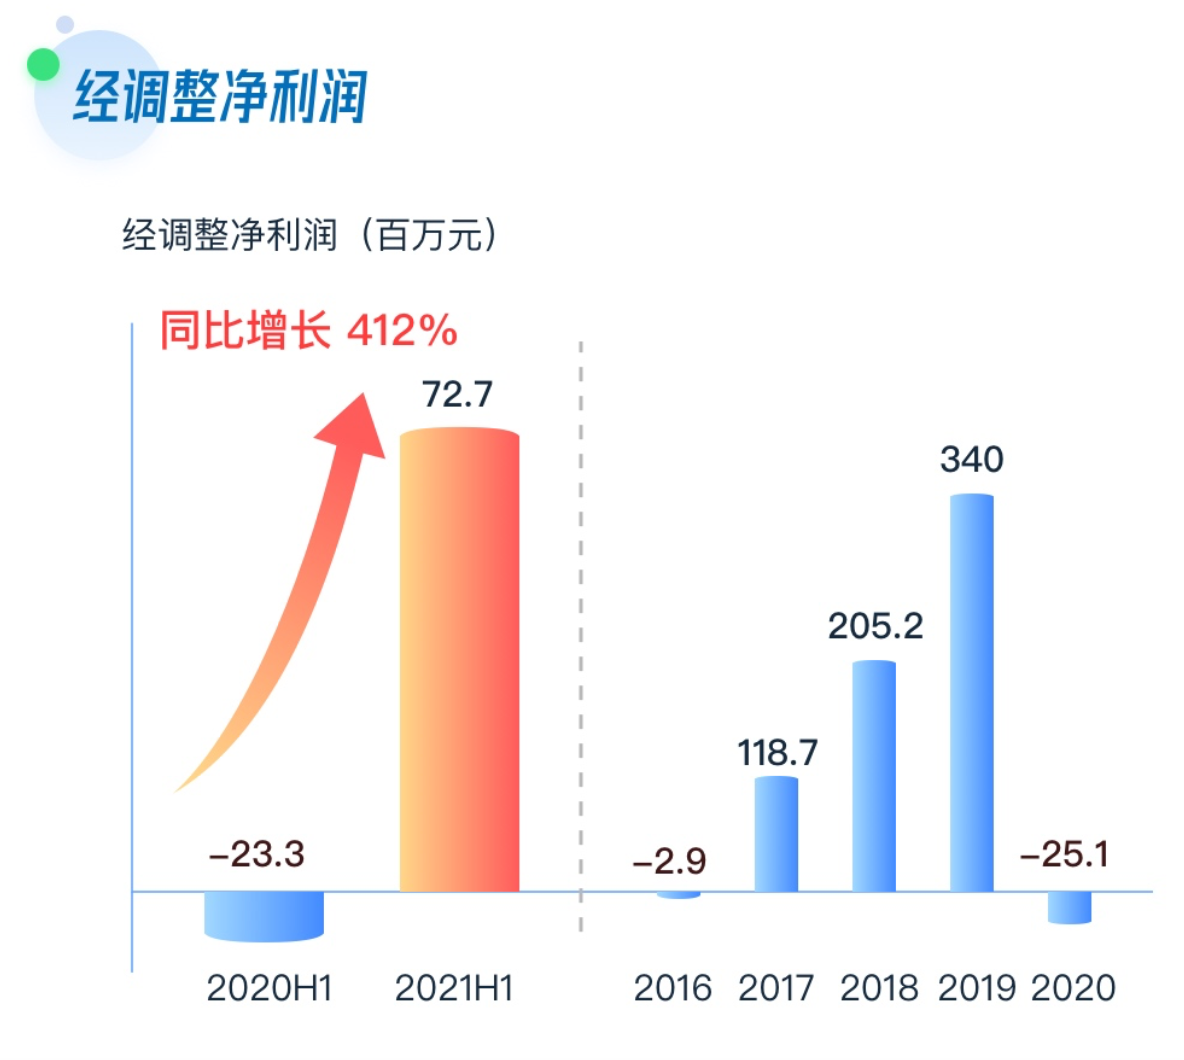 SaaS业务收入增长显著,兑吧中期扭亏为盈营收同比增长53.82%